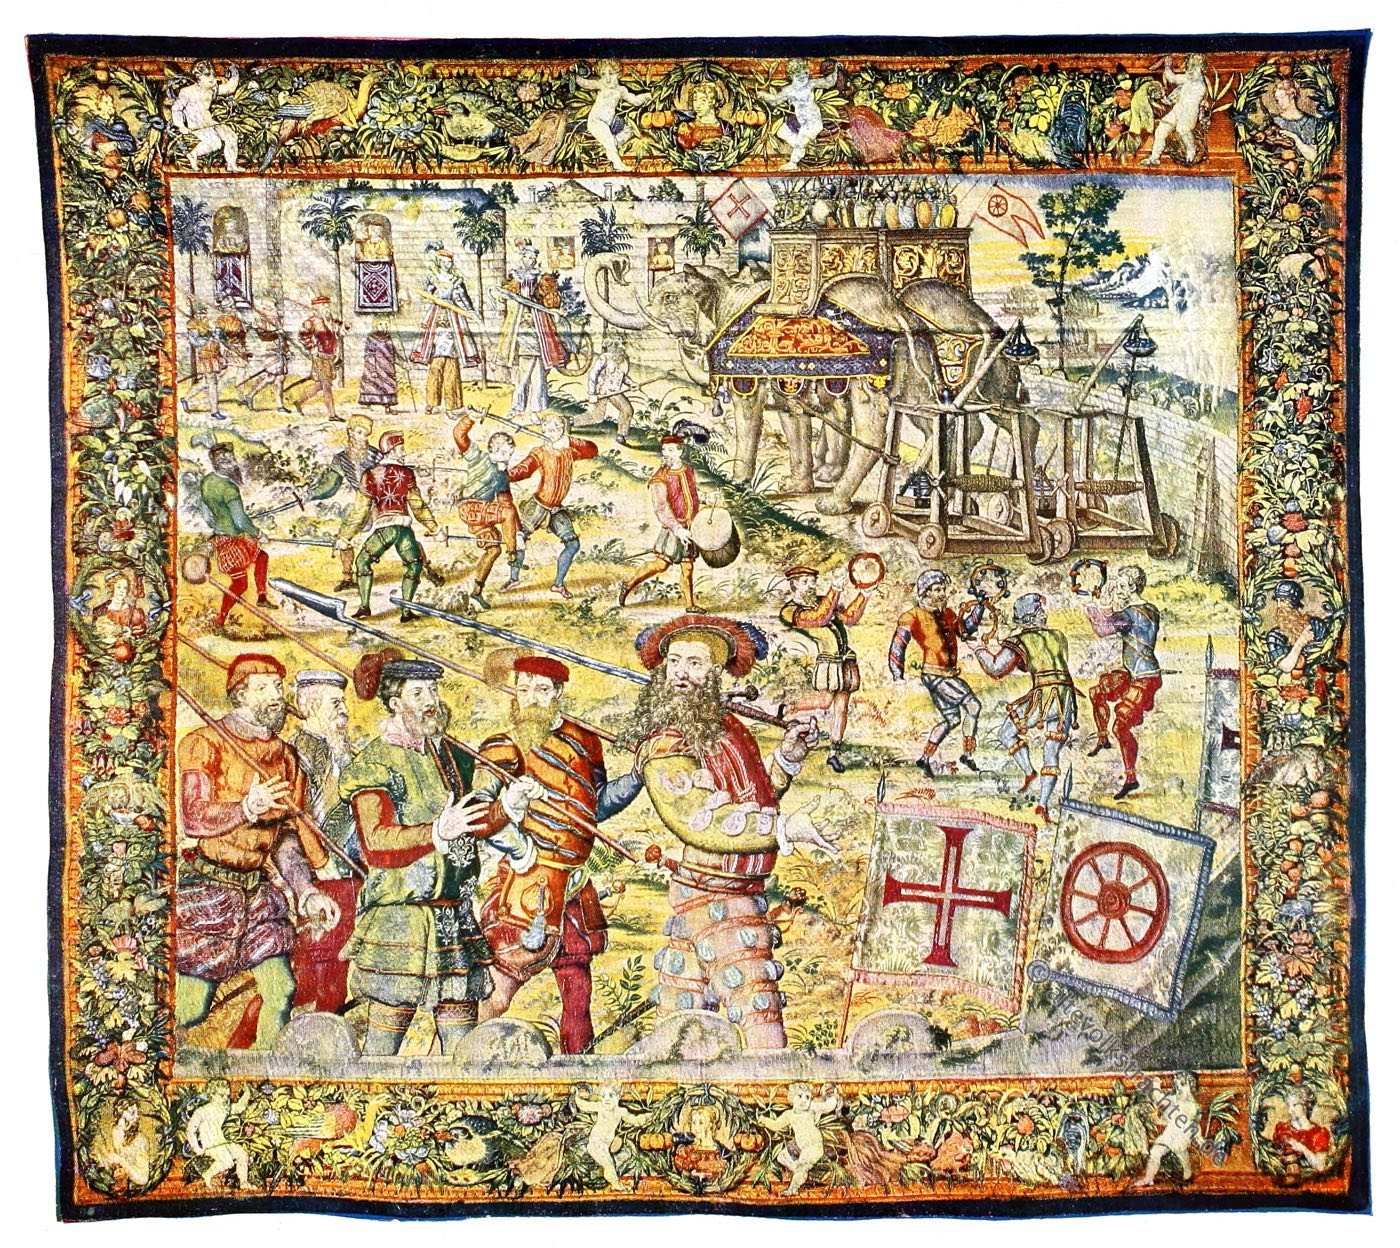 Gobelin, Renaissance, Triumphzug, Joao de Castro, Goa, Kunsthistorie, Gobelinsammlung, Brüssel, 16. Jahrhundert, Wien